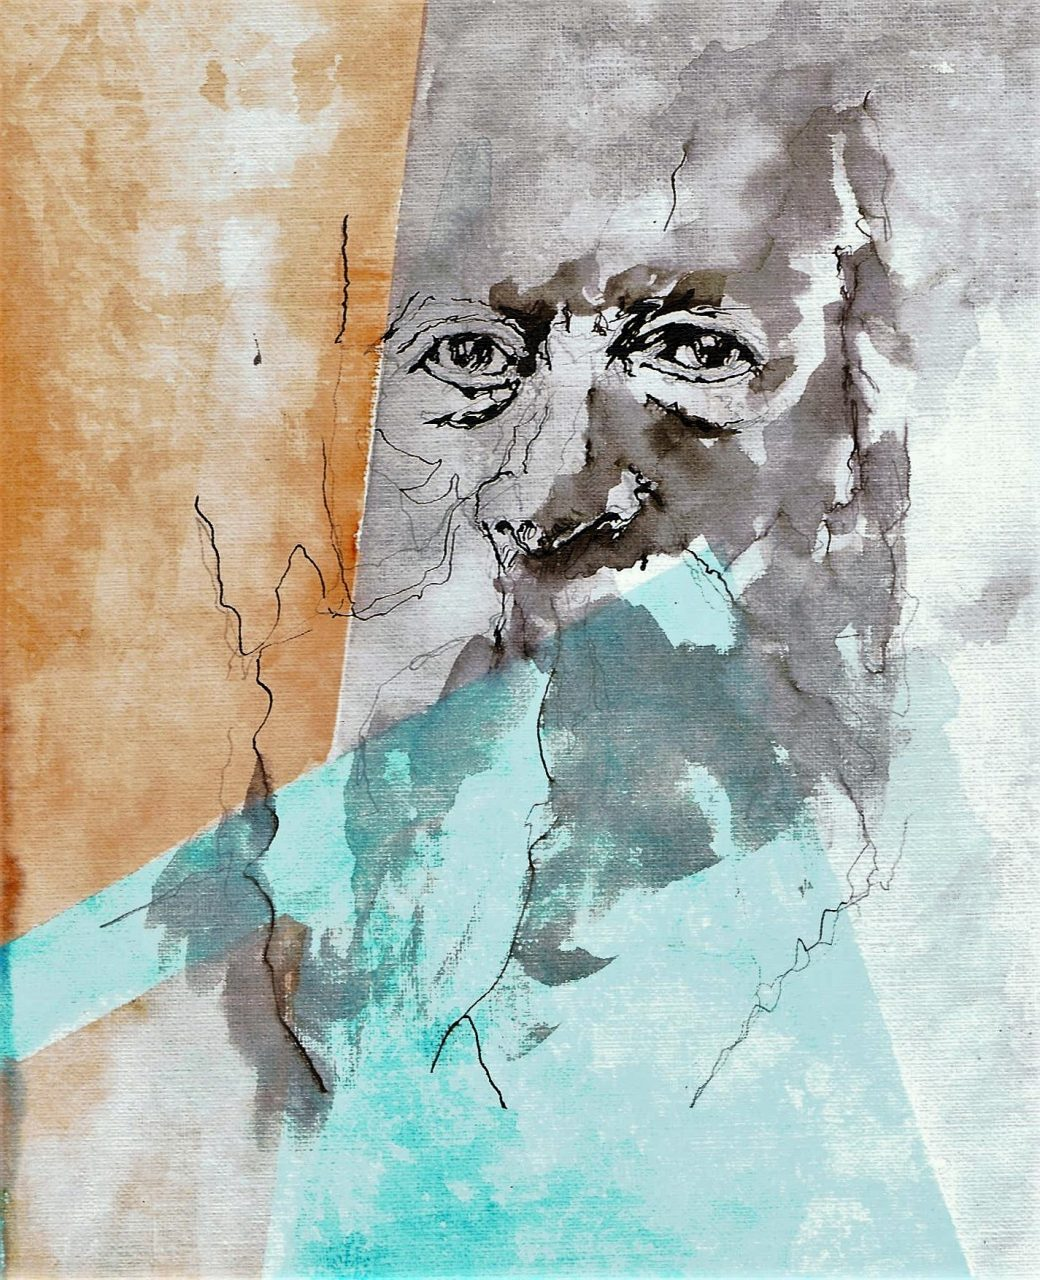 365 dagen een portret 157 Martin Buber. filosoof Aquarel en inkt 19c25